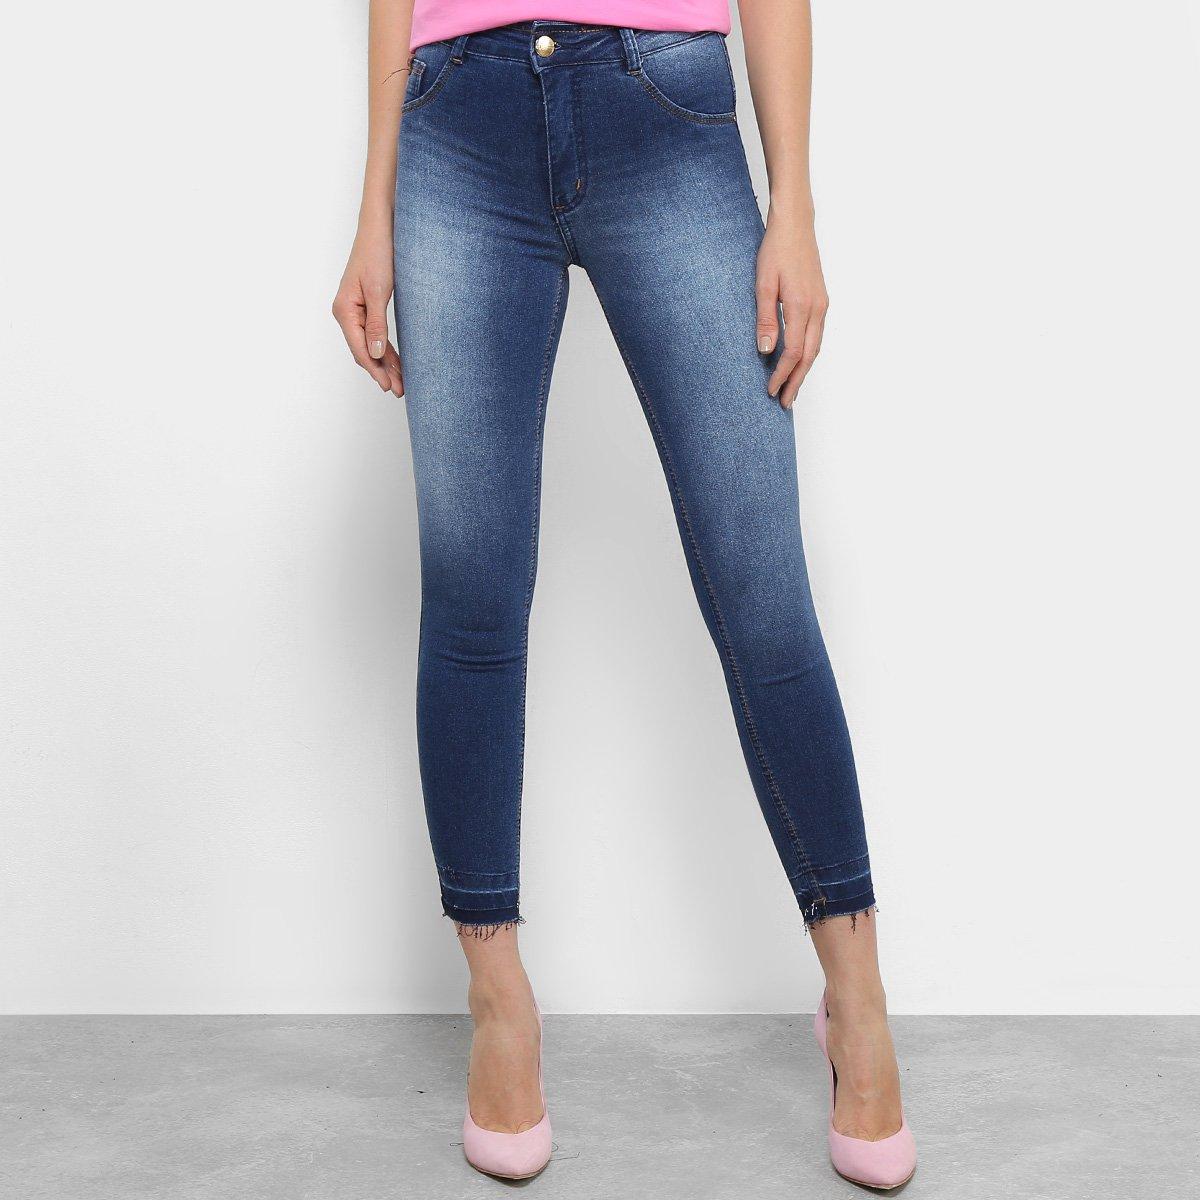 66782325c Calça Jeans Skinny Biotipo Melissa Cintura Média Soft Feminina ...